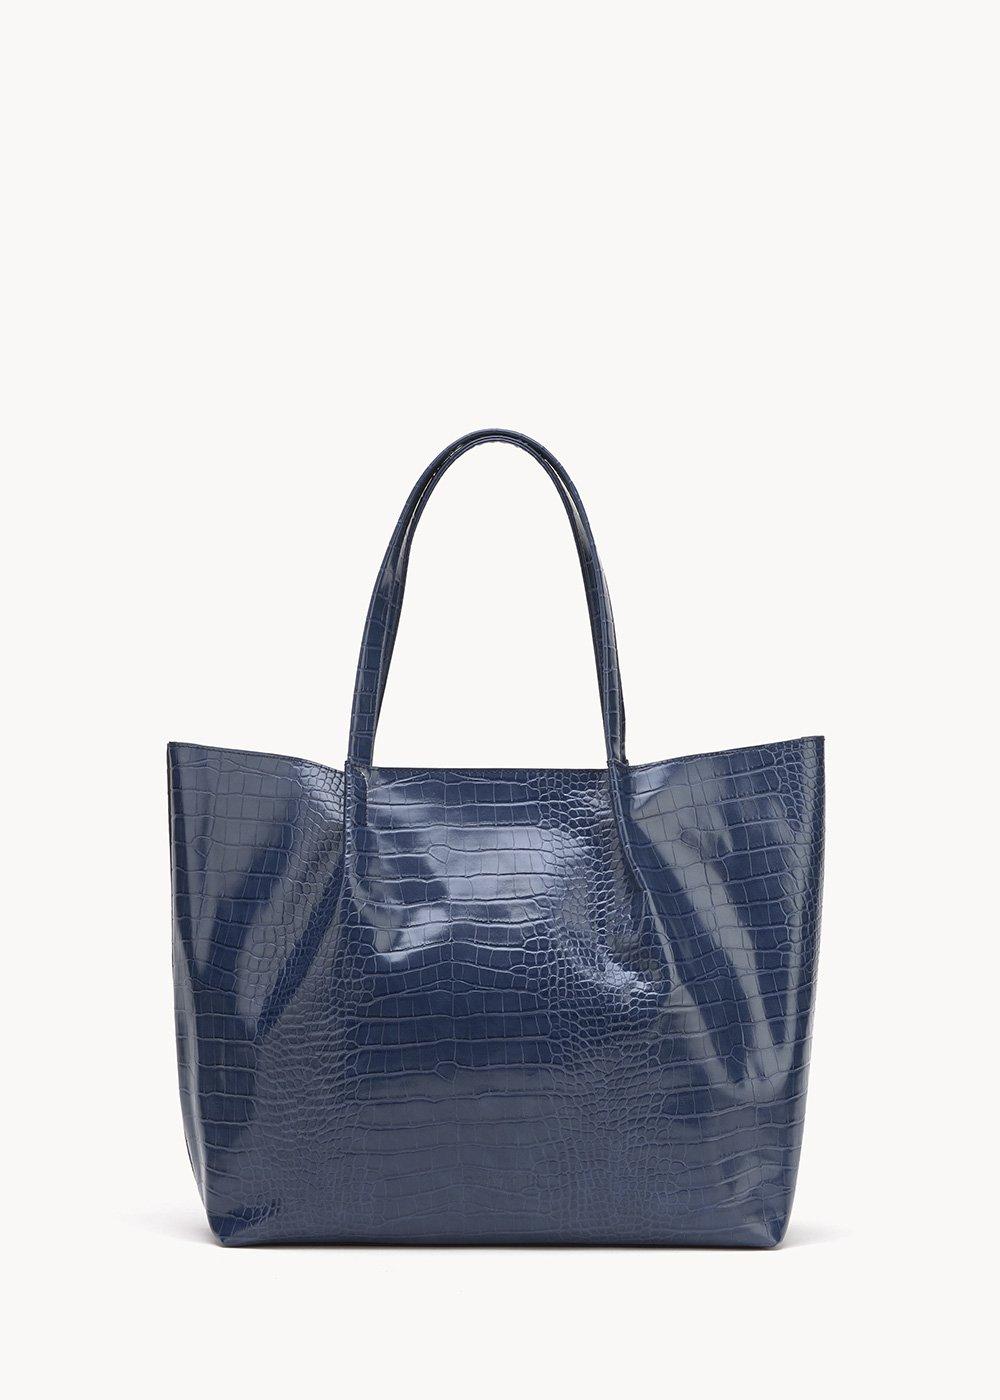 Shopping bag Blanch stampa cocco - Marina - Donna